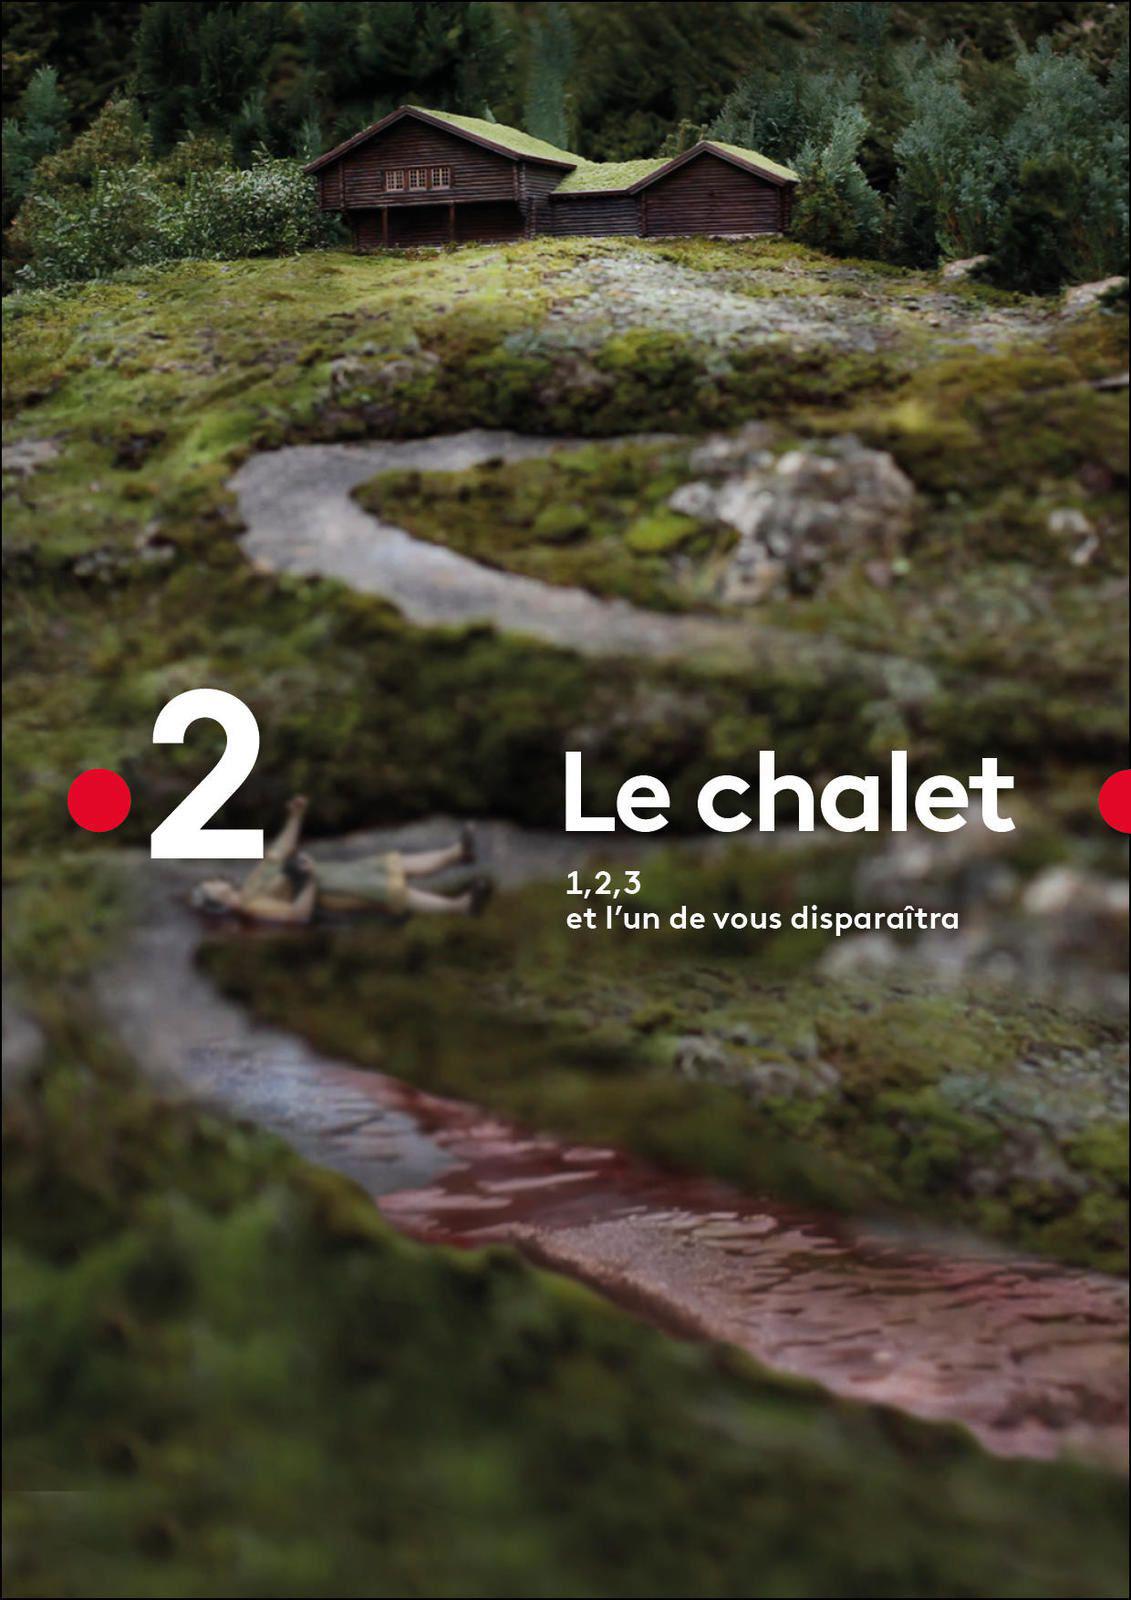 LE CHALET_CristalPublishing